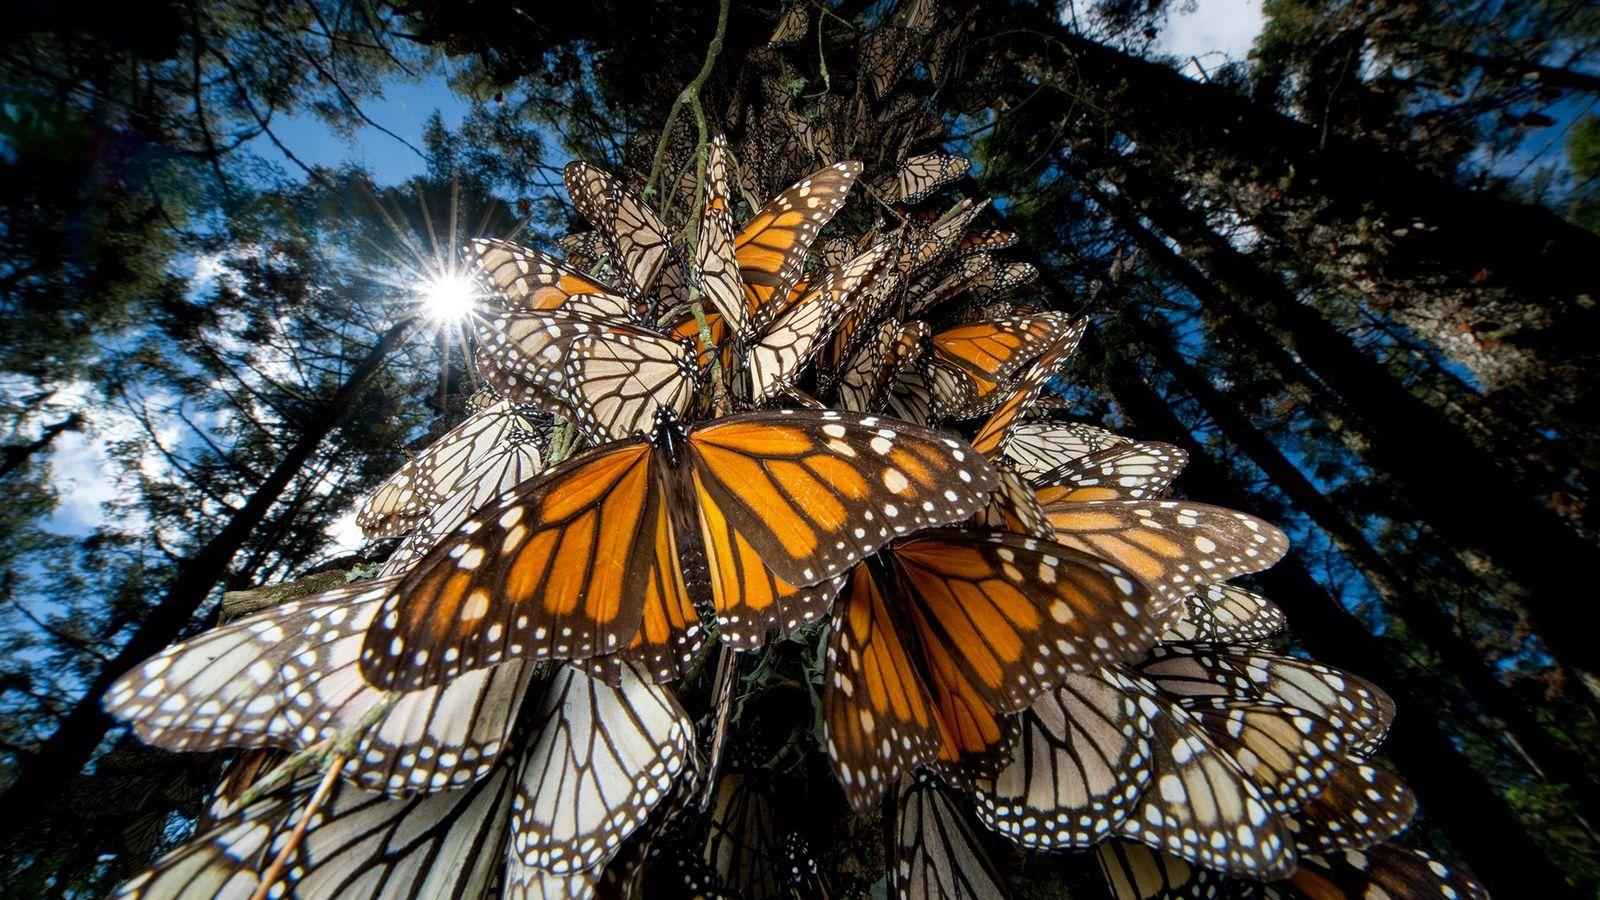 Mariposas monarca